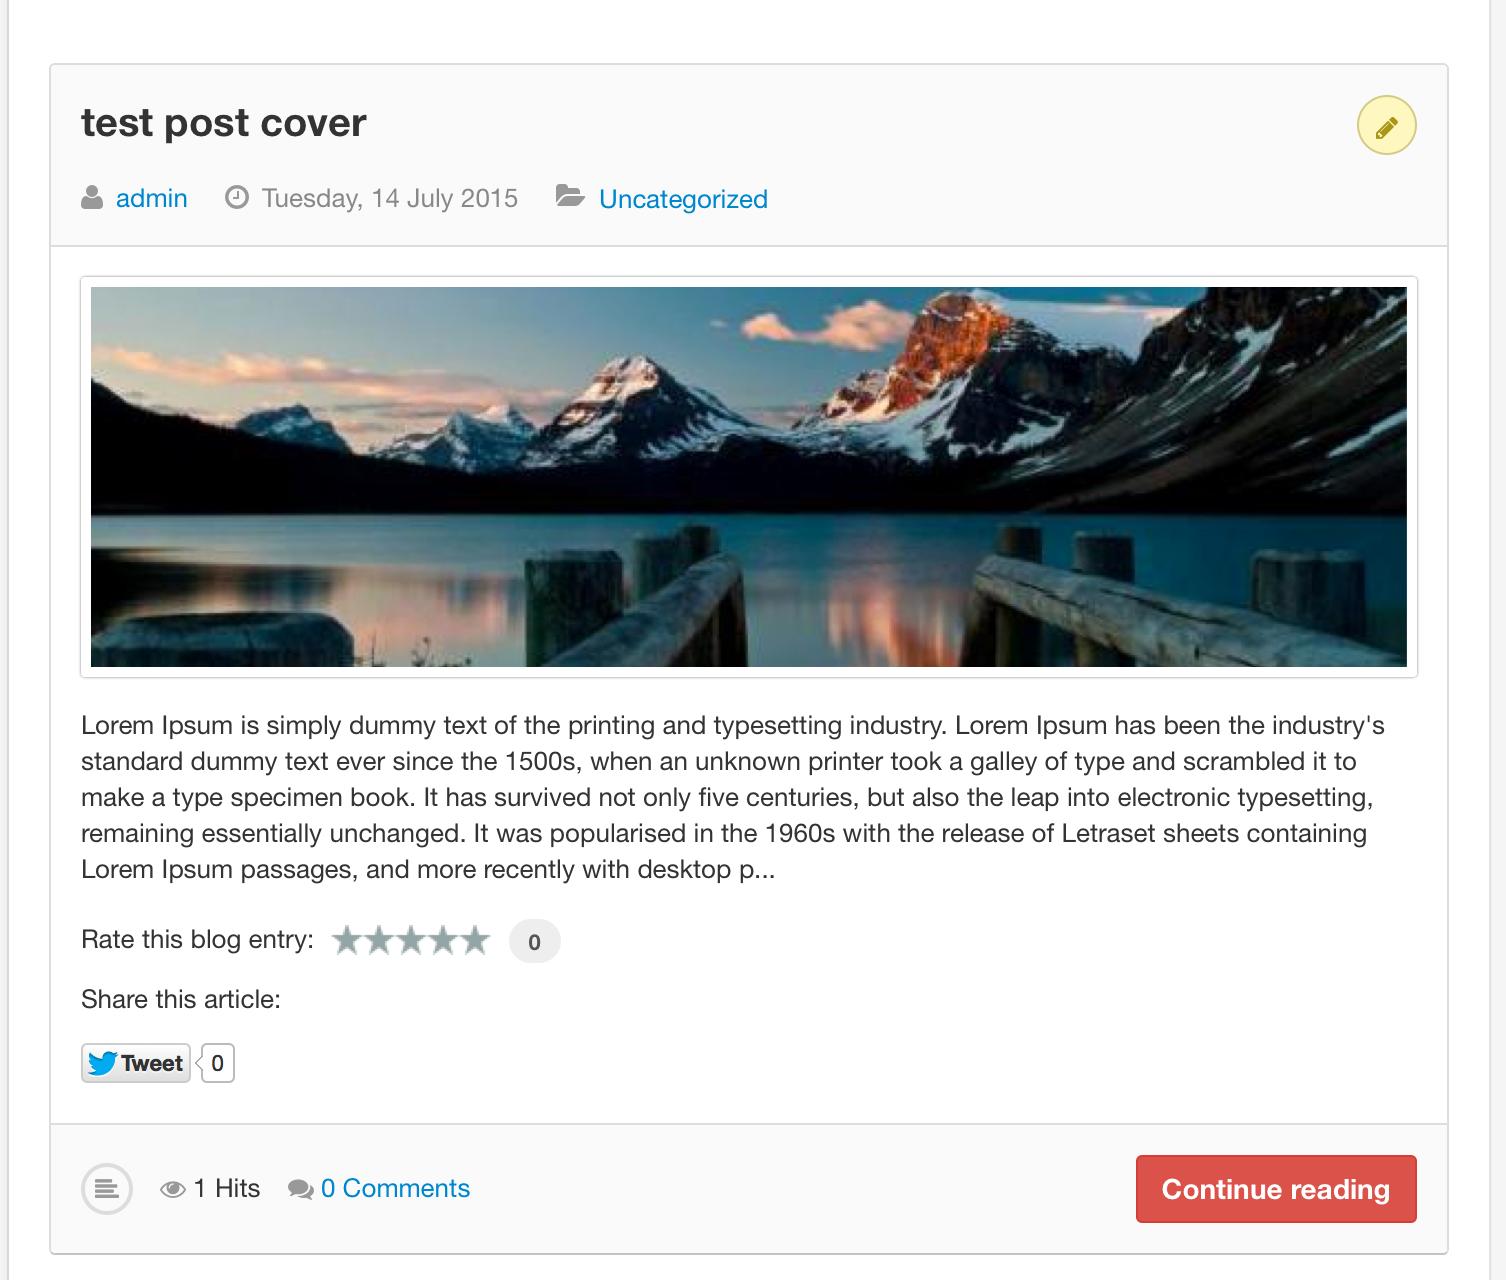 http://cloud.stackideas.com/images/easyblog_images//21209/easyblog5_0_16/post_cover_full_width.png